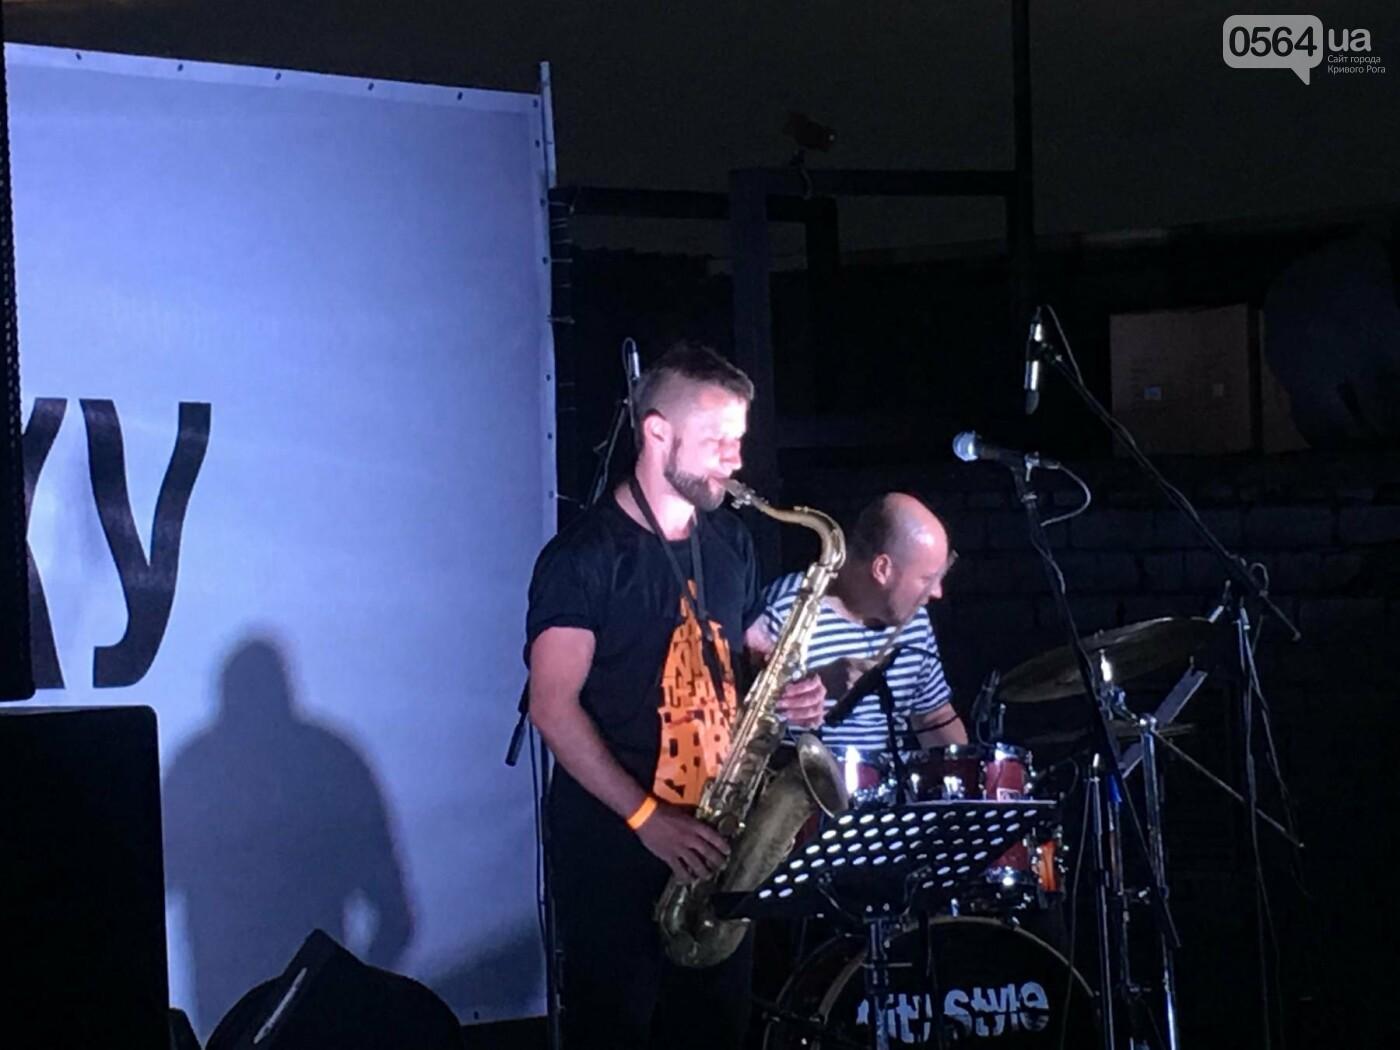 Сотни криворожан встречали закат на крыше отеля под мелодии джаза, - ФОТО, ВИДЕО, фото-7